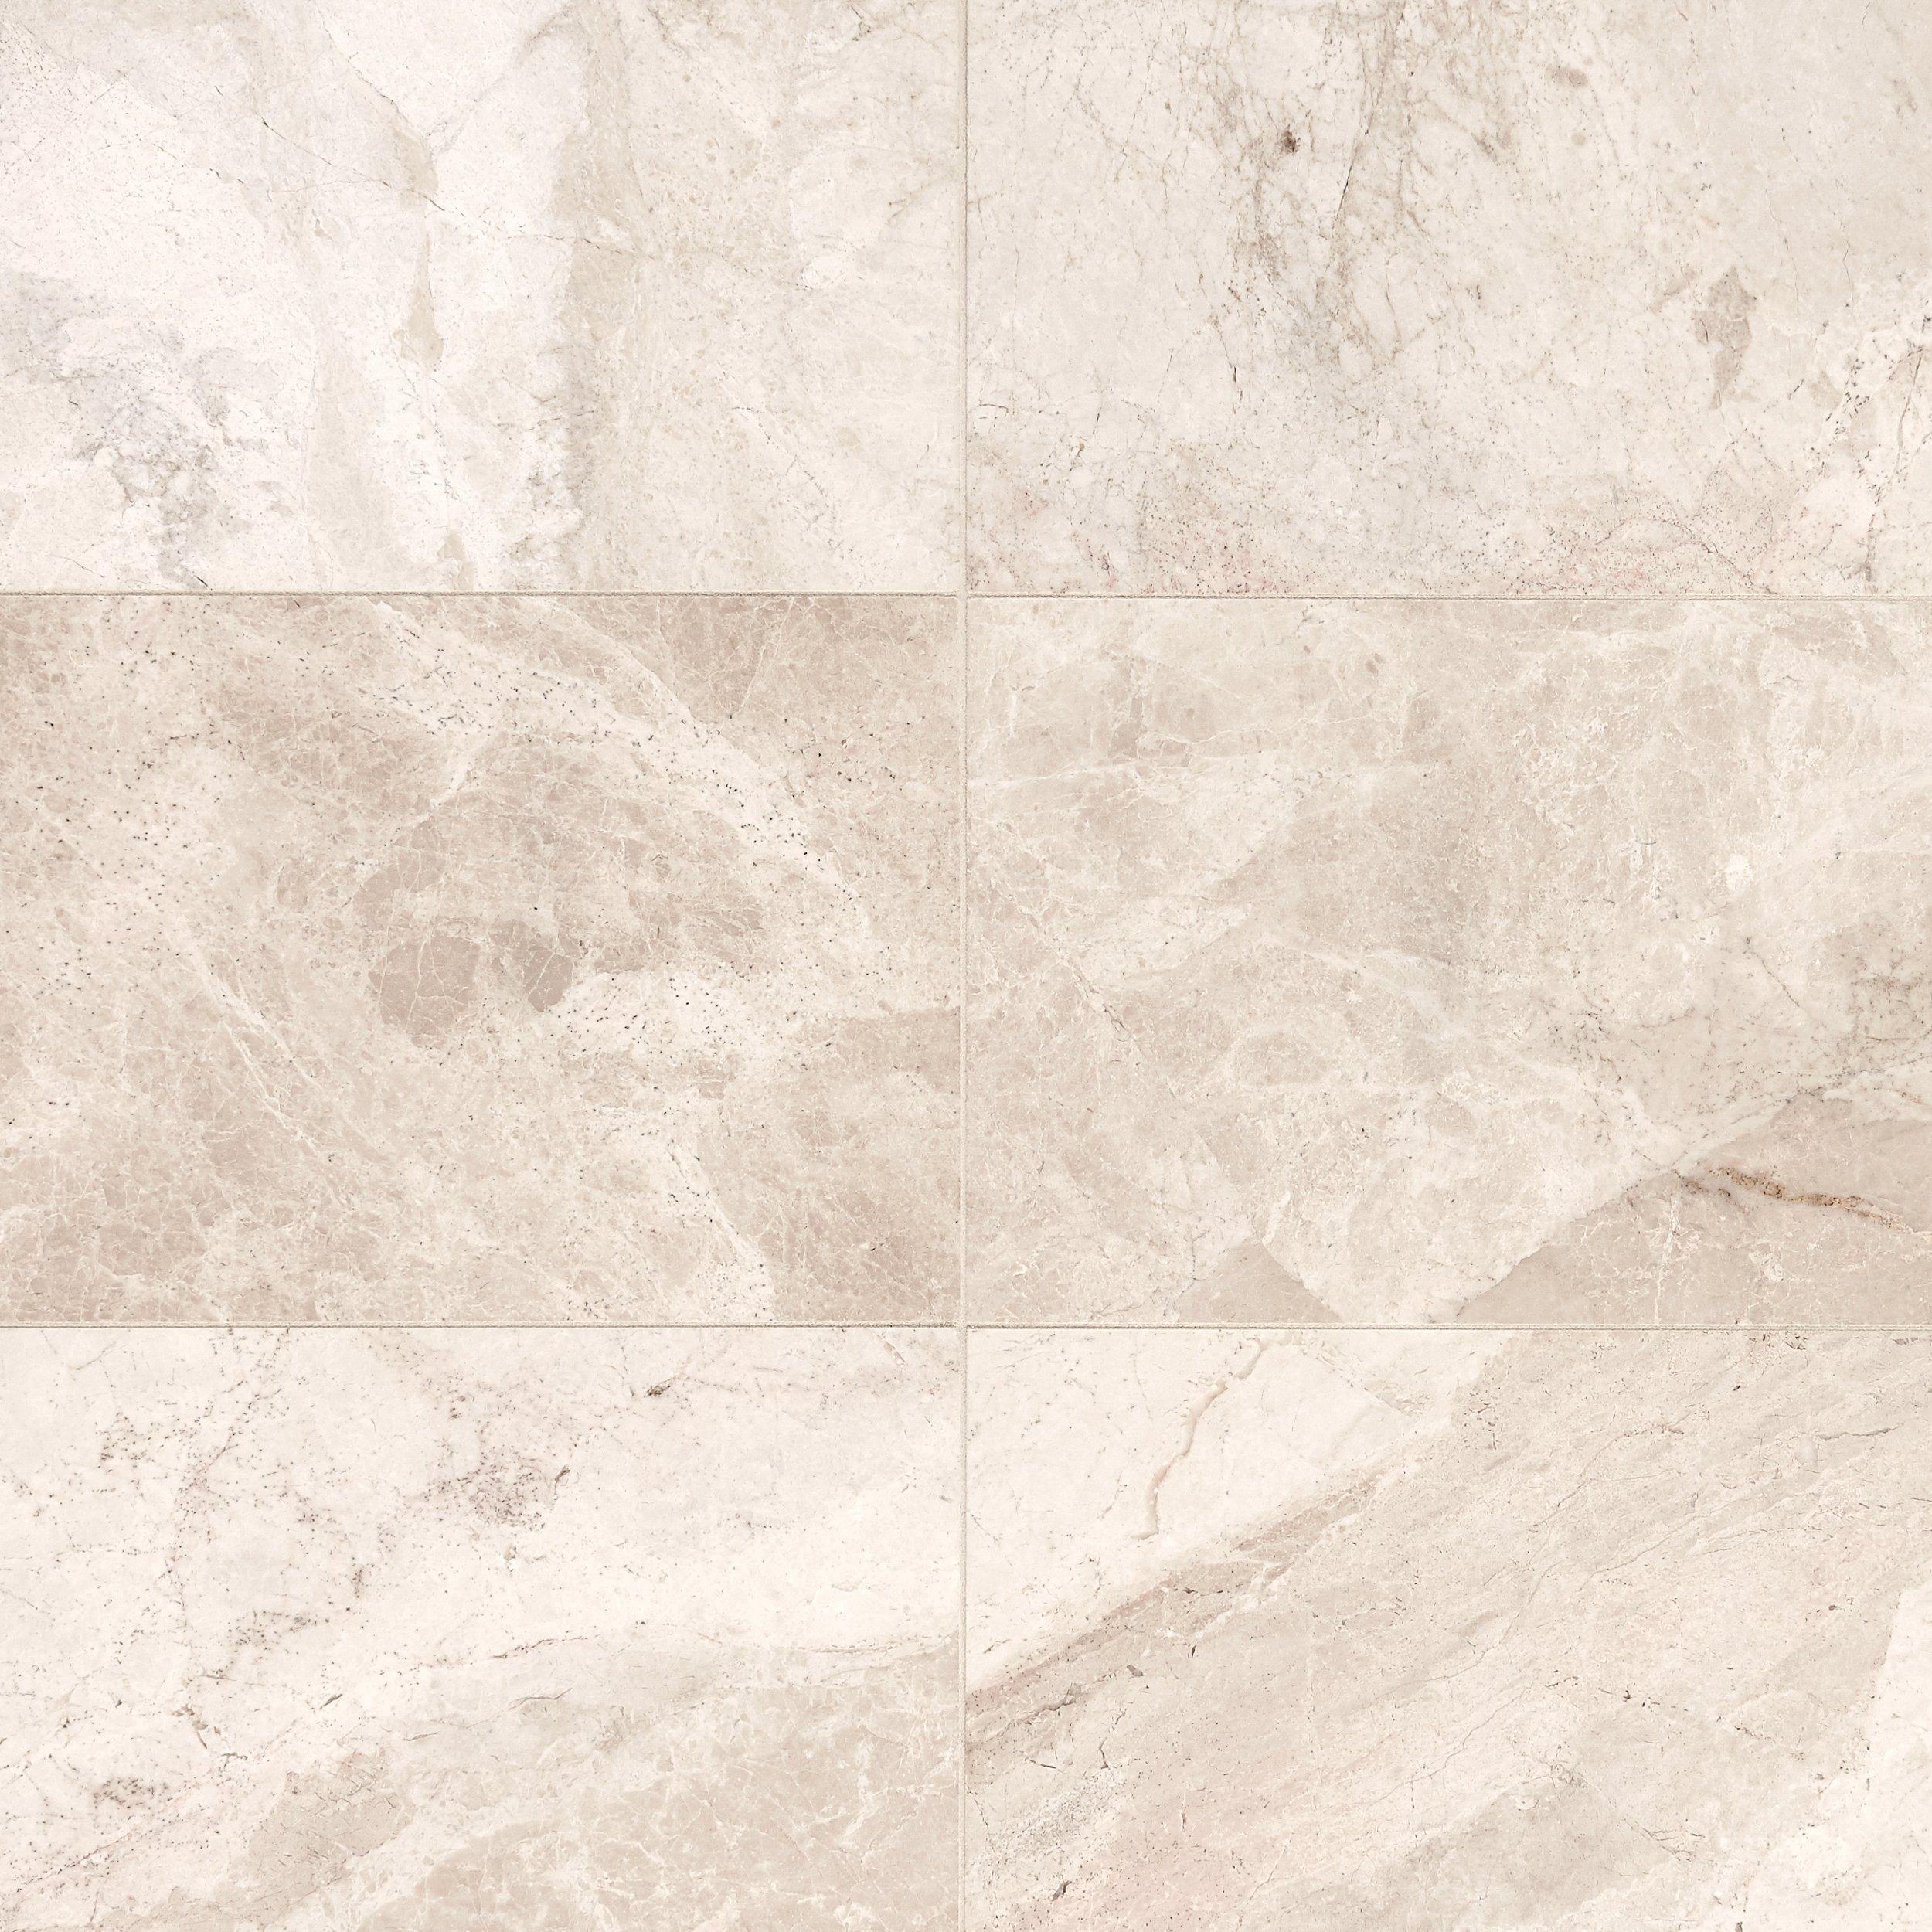 Crema Bella Classic Polished Marble Tile 12 X 24 100051697